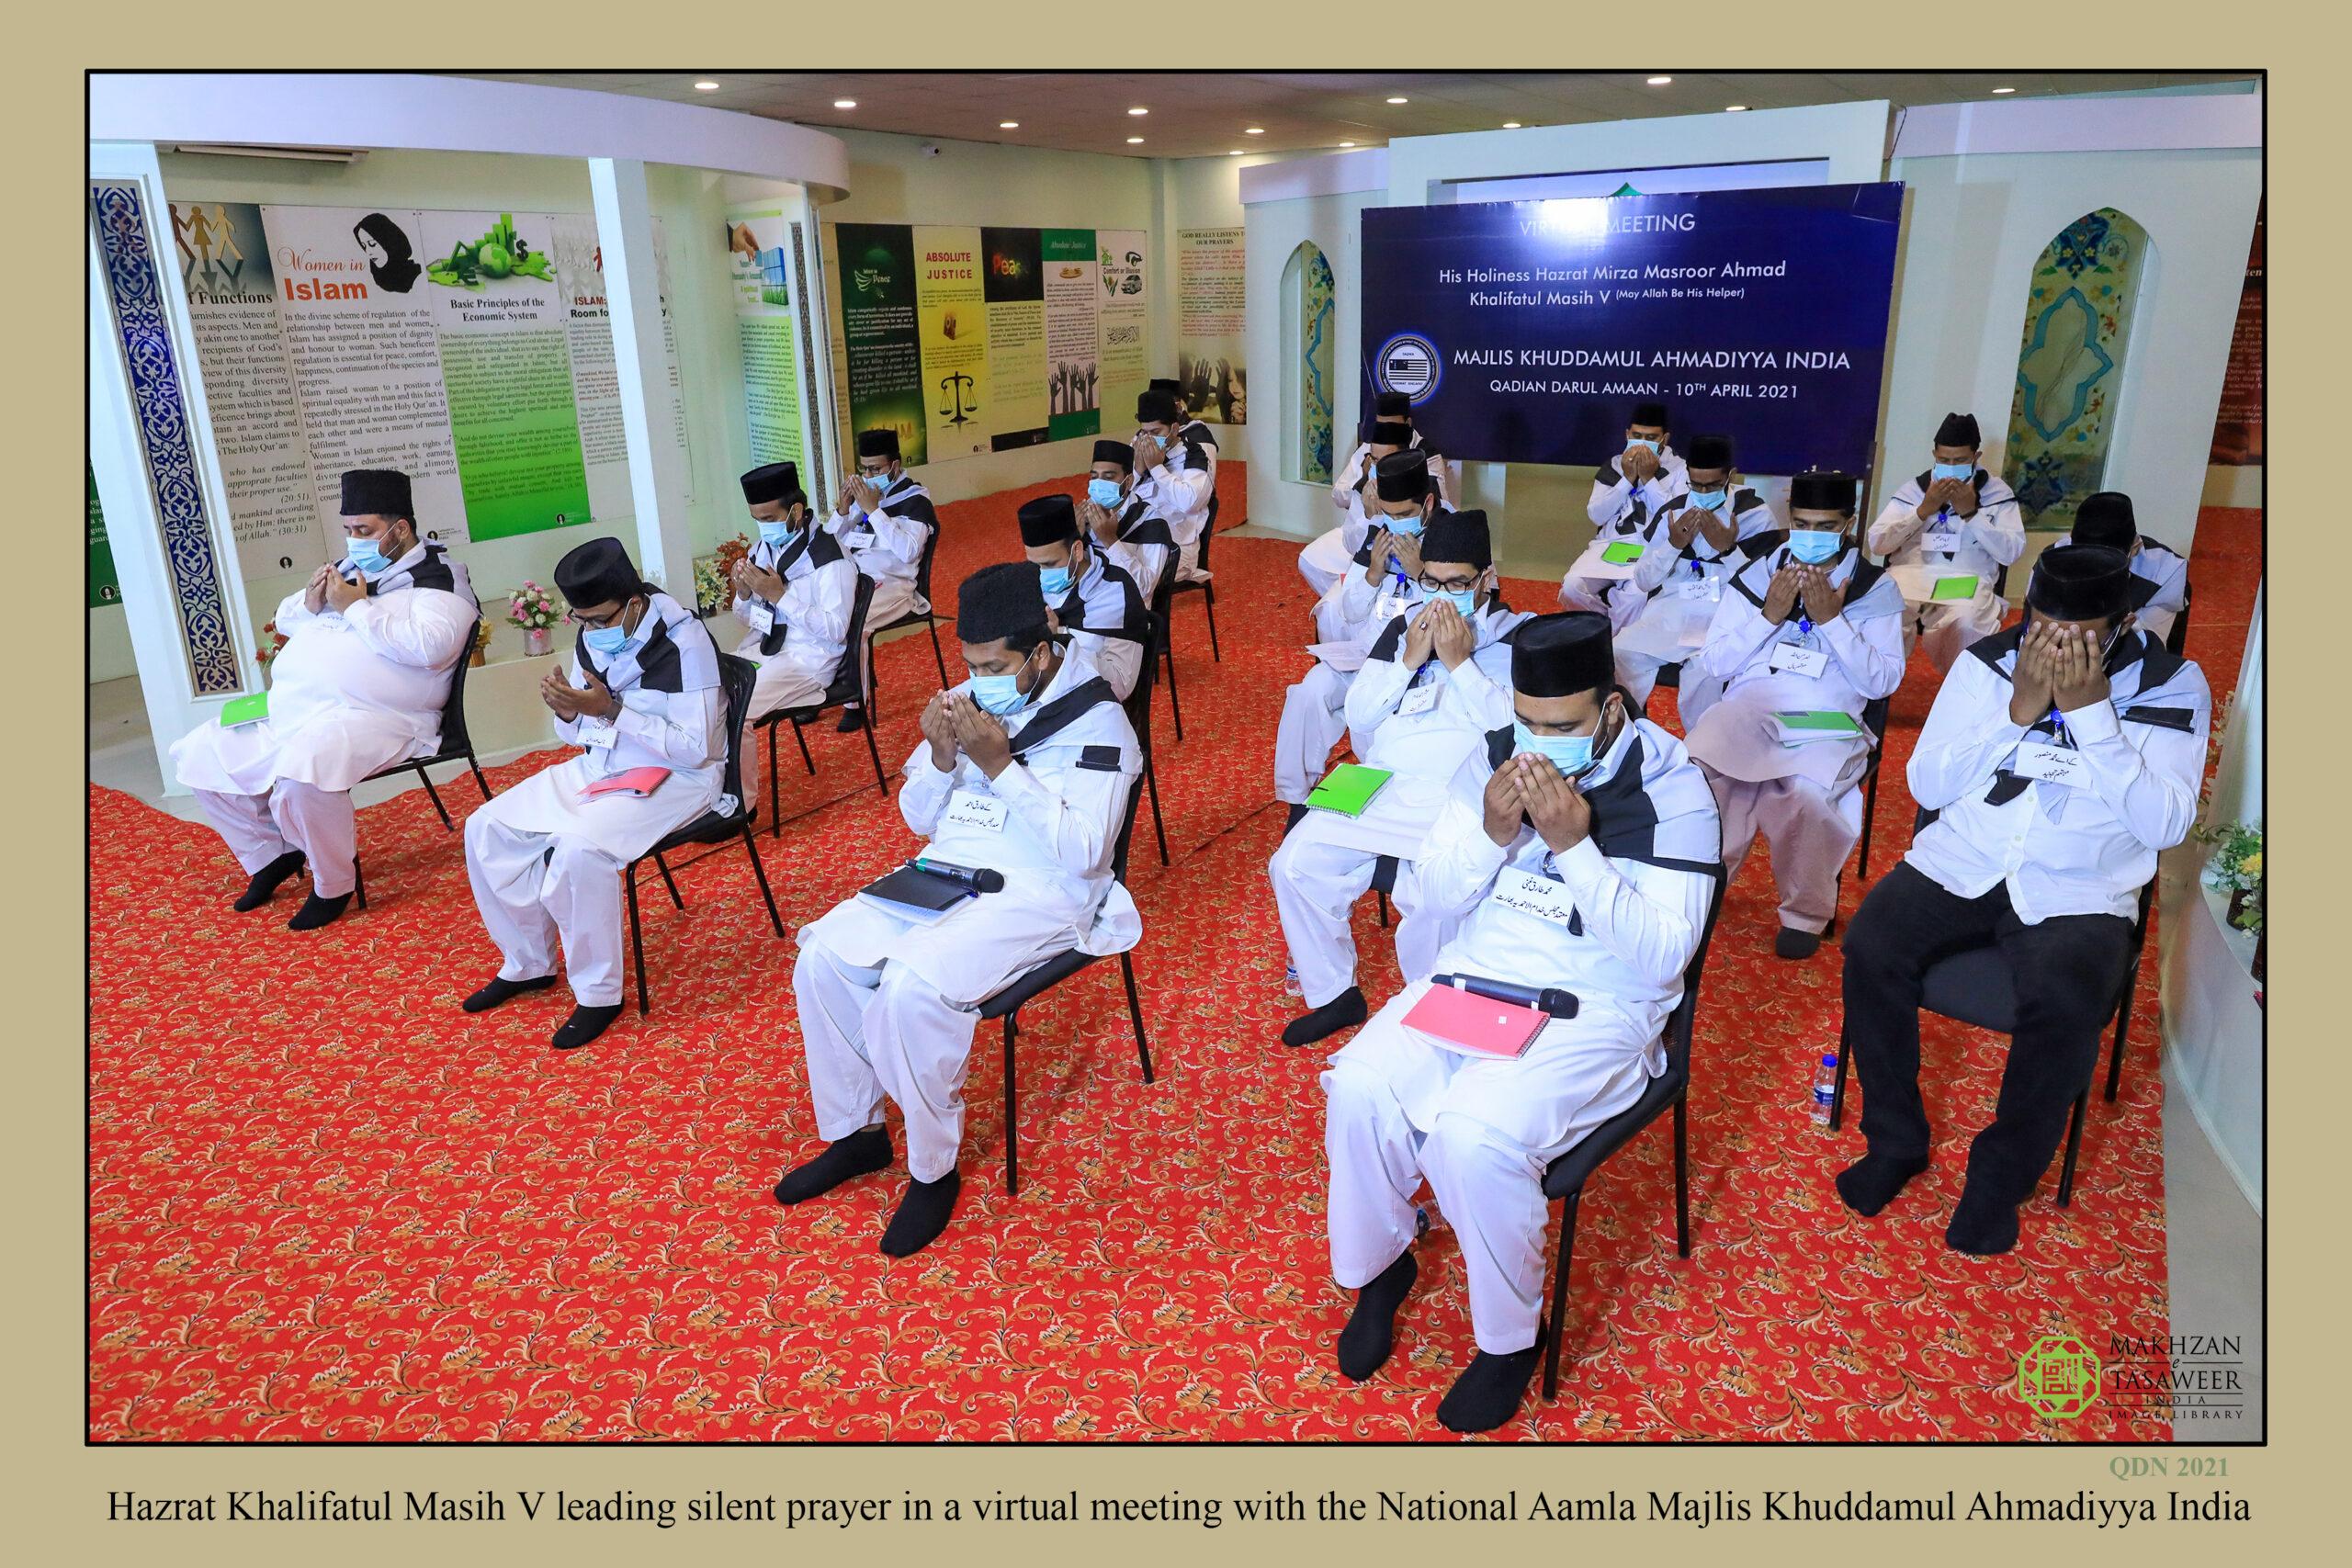 Hazrat Khalifatul Masih V grants a virtual meeting to the national Aamla Majlis Khuddamul Ahmadiyya India 002